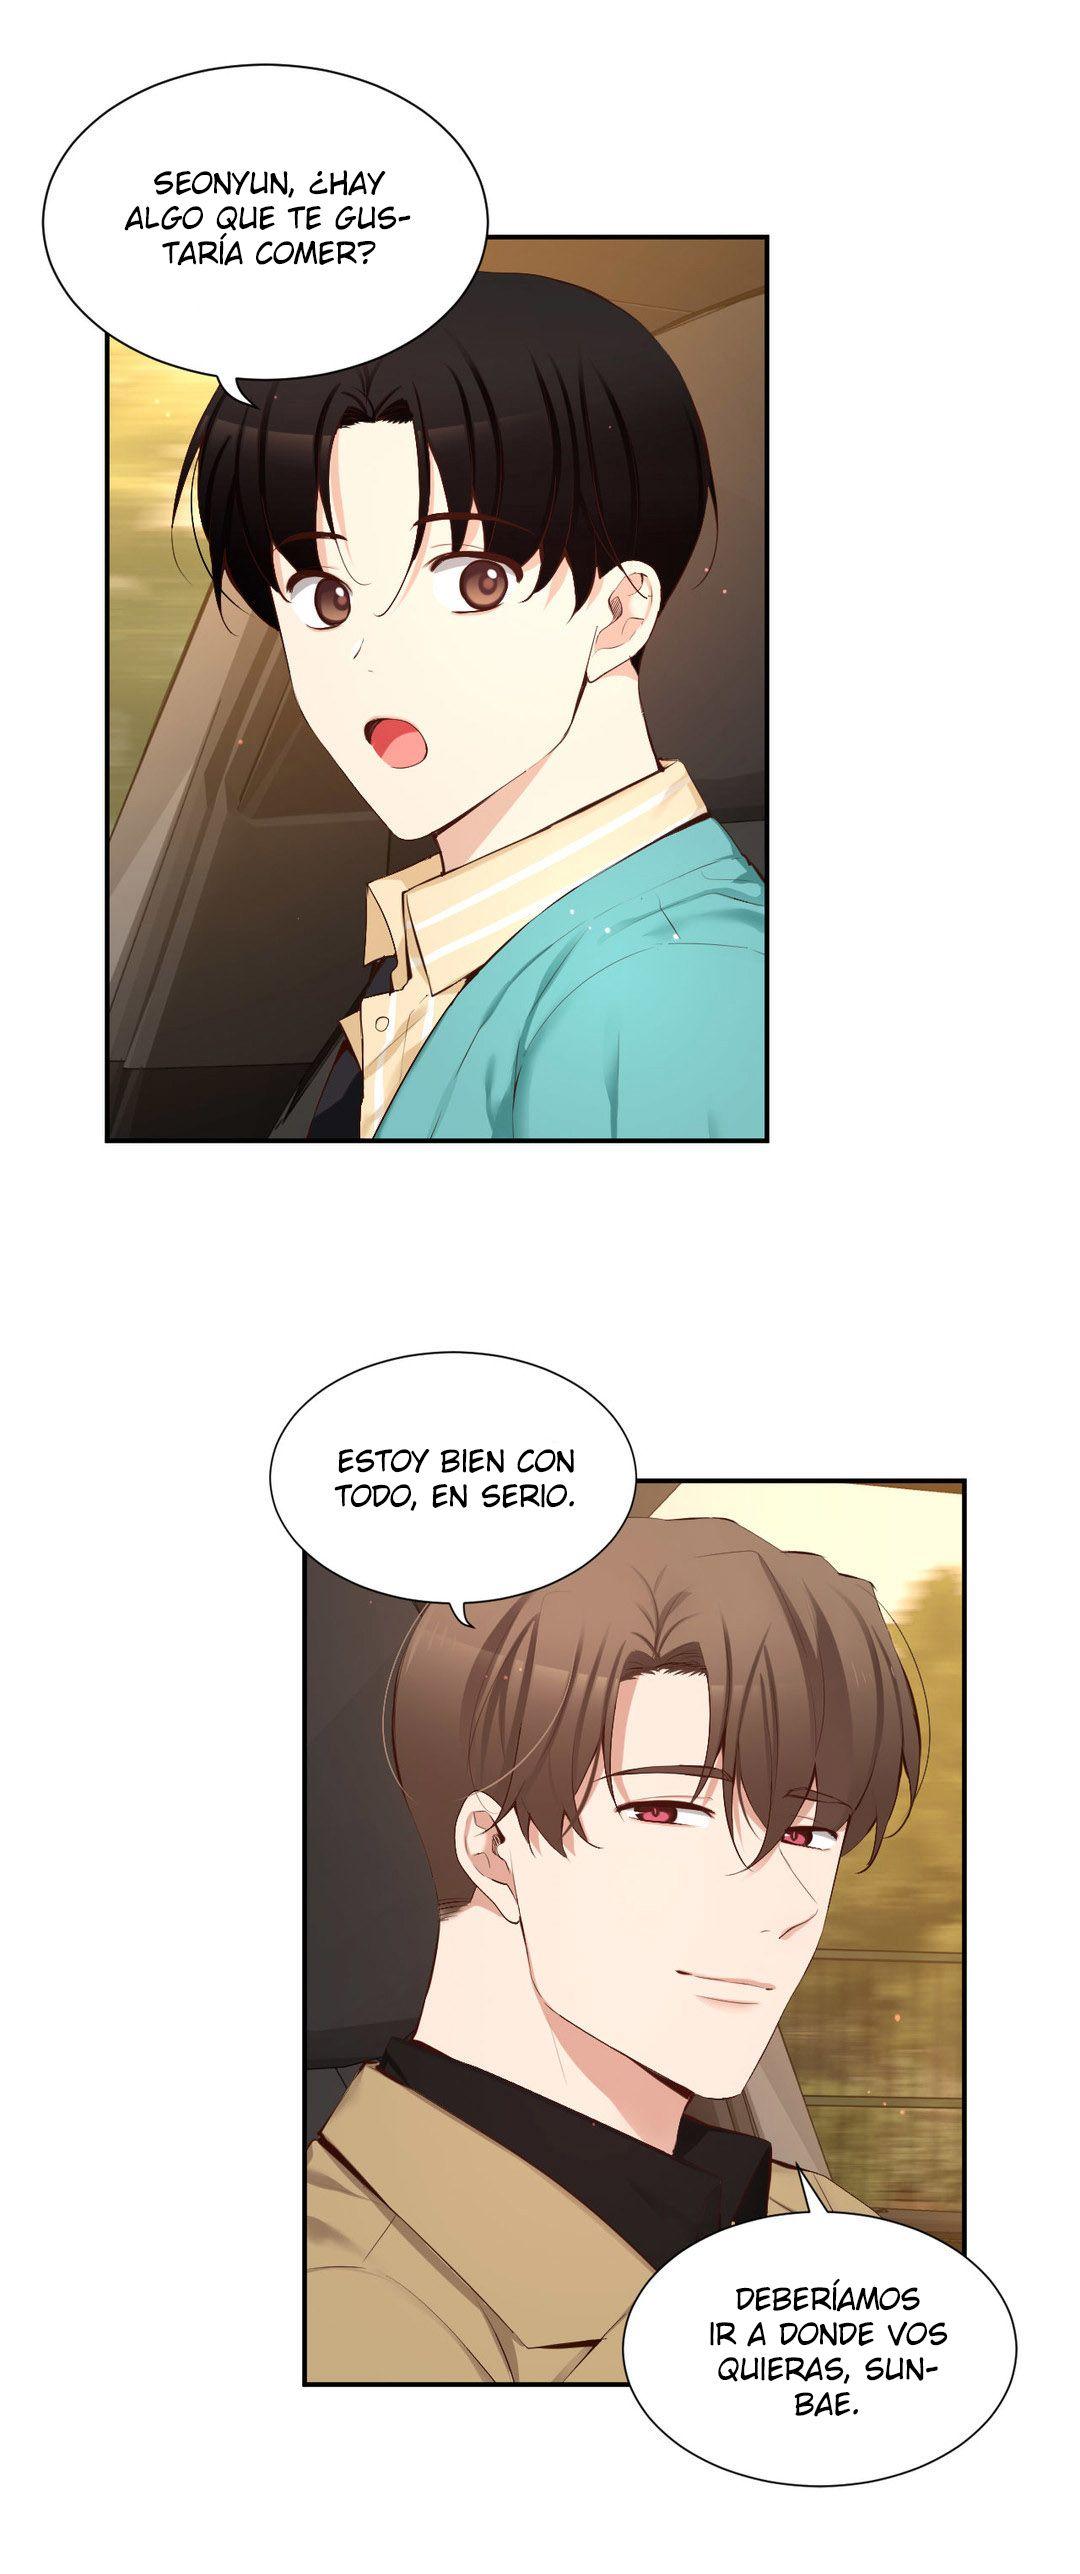 https://c9.mangatag.com/es_manga/pic5/44/22188/638428/0927da57793ffe3c0ac6897e97fd1103.jpg Page 3